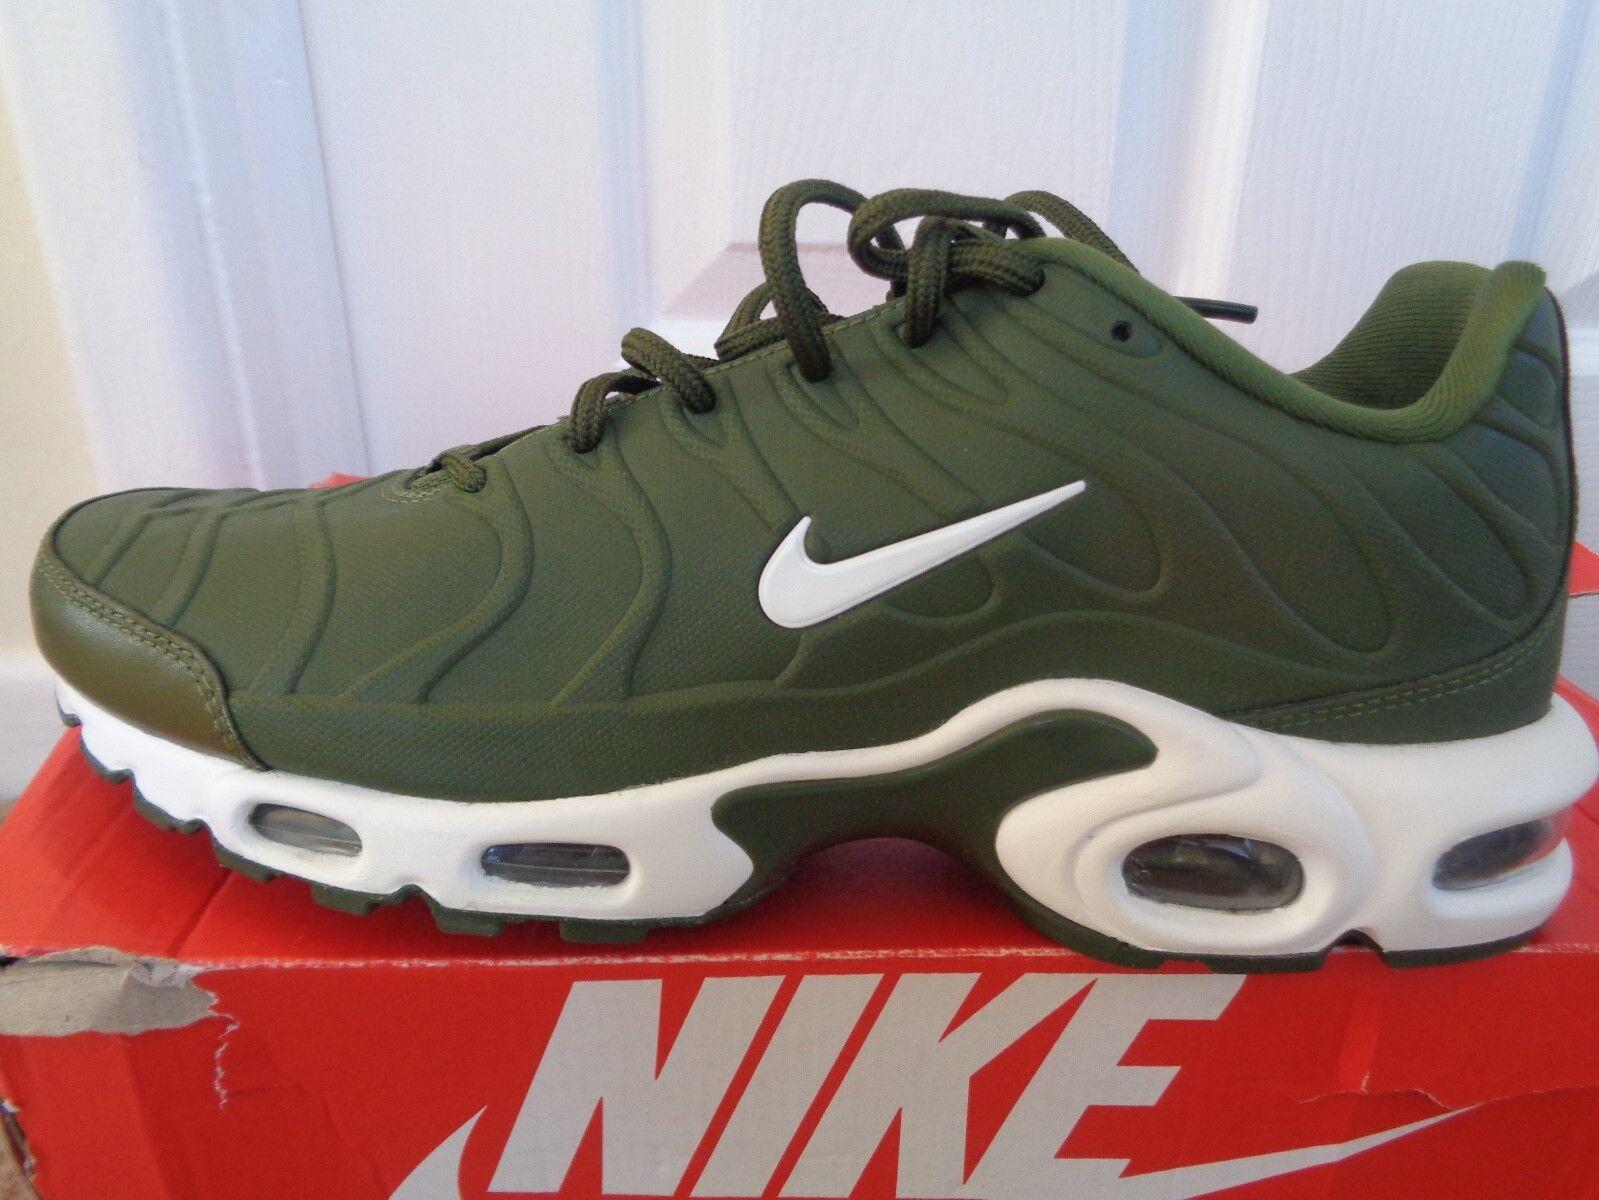 Nike Air max plus VT trainers sneakers 505819 300 uk 7.5 eu 42 us 8.5 NEW+BOX